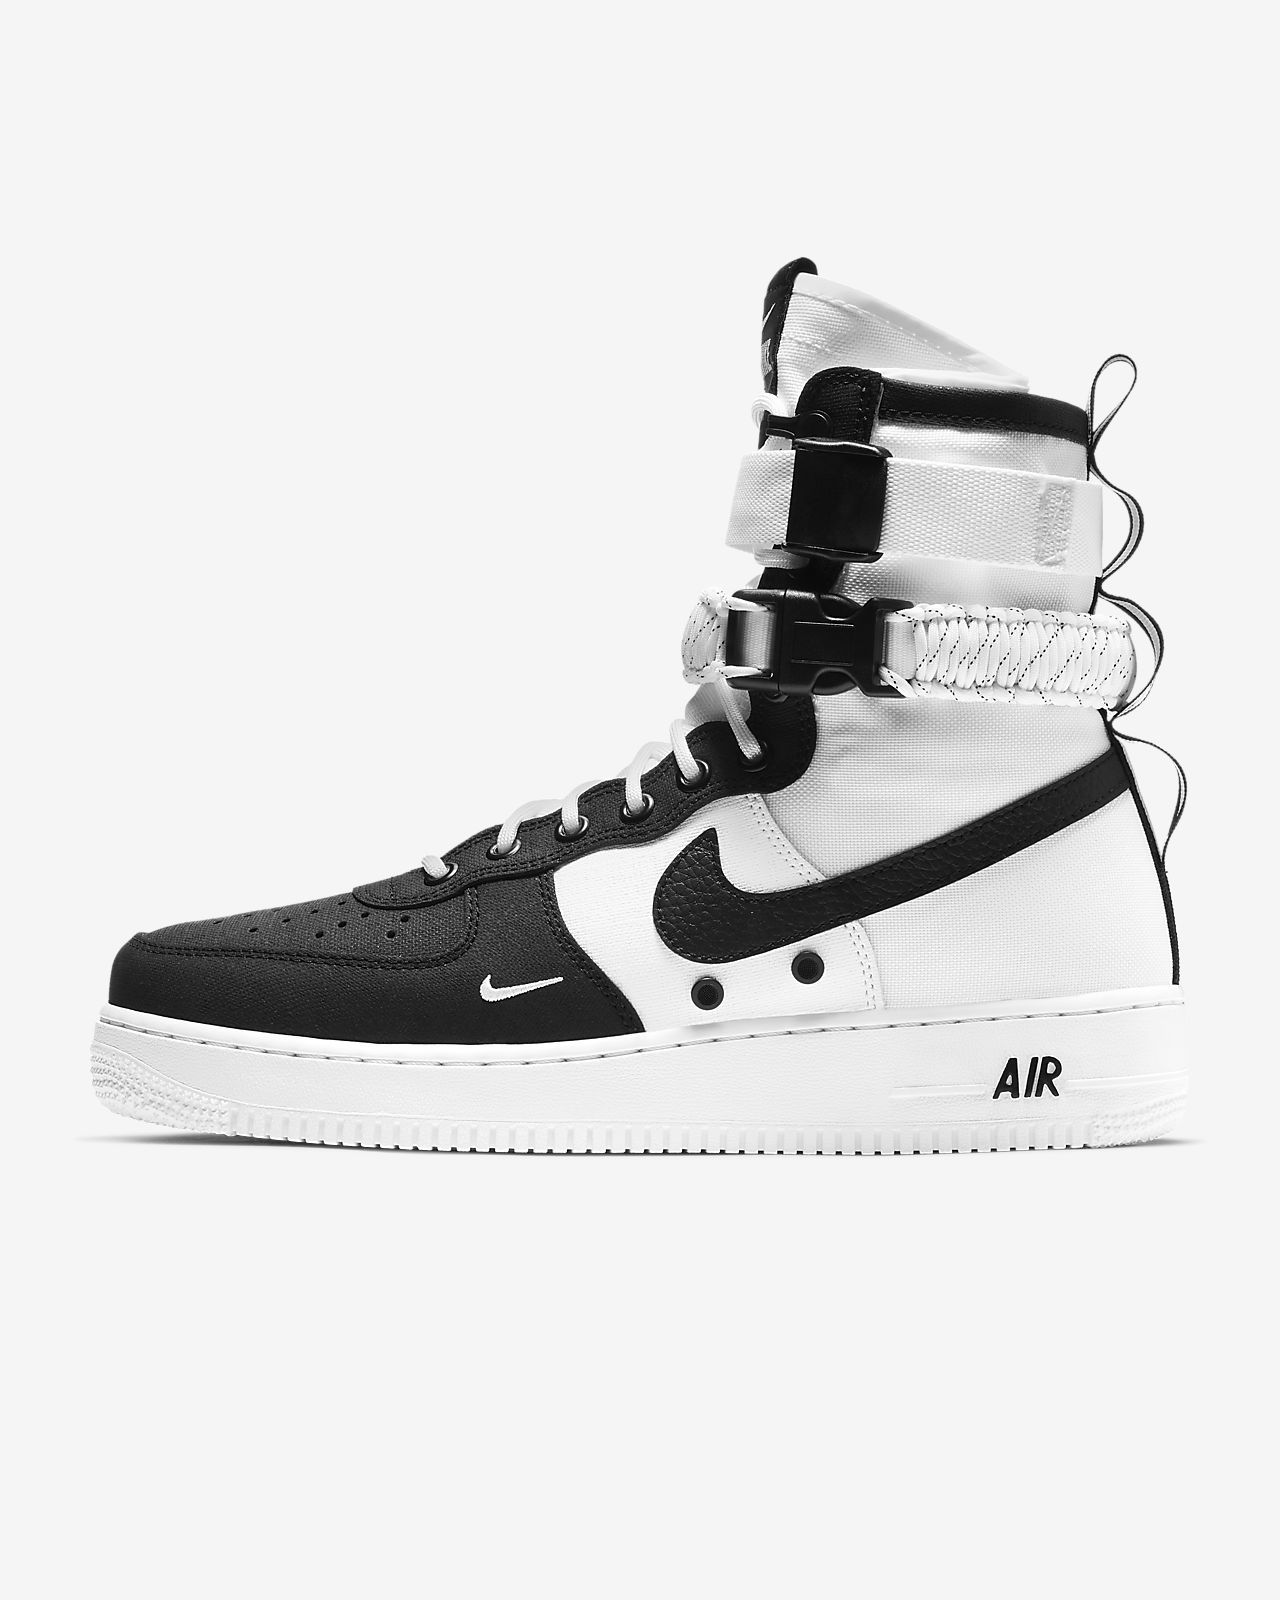 46++ Air force 1 boots ideas ideas